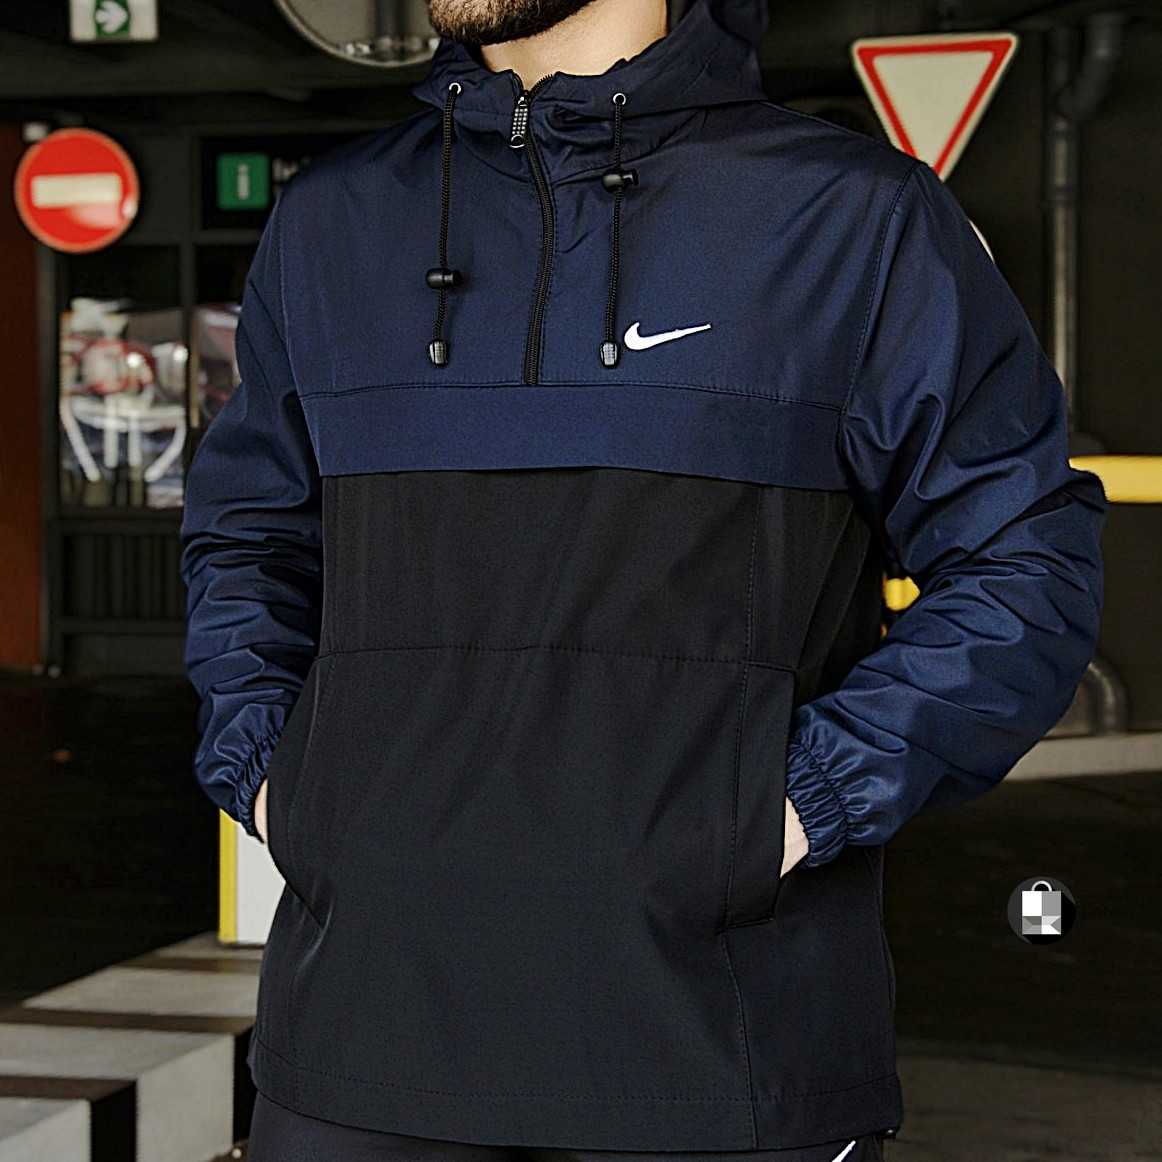 Размеры S-3XL | Мужская куртка анорак Nike Blue Синий